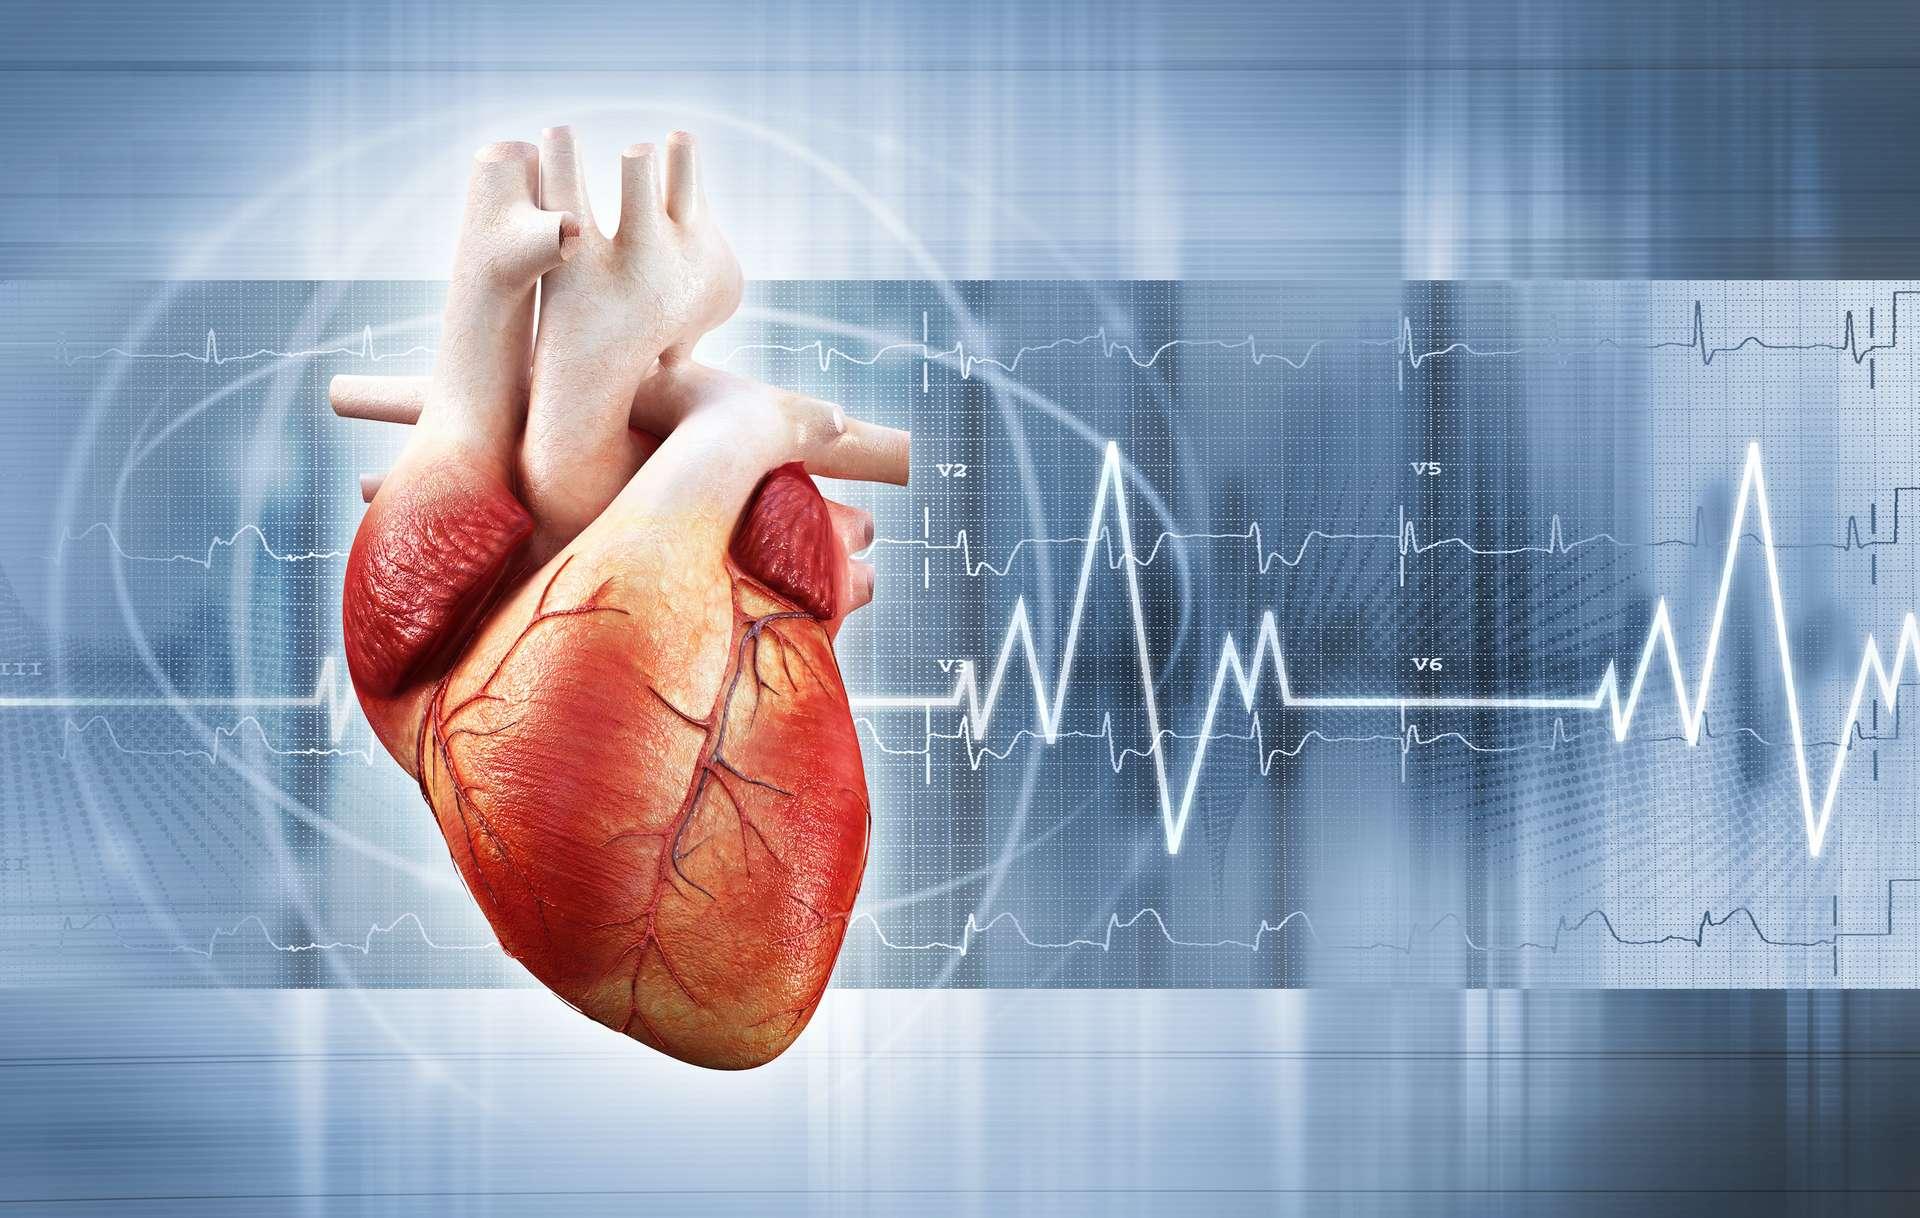 Les personnes de grande taille ont un risque accru de fibrillation auriculaire. © adimas, Adobe Stock